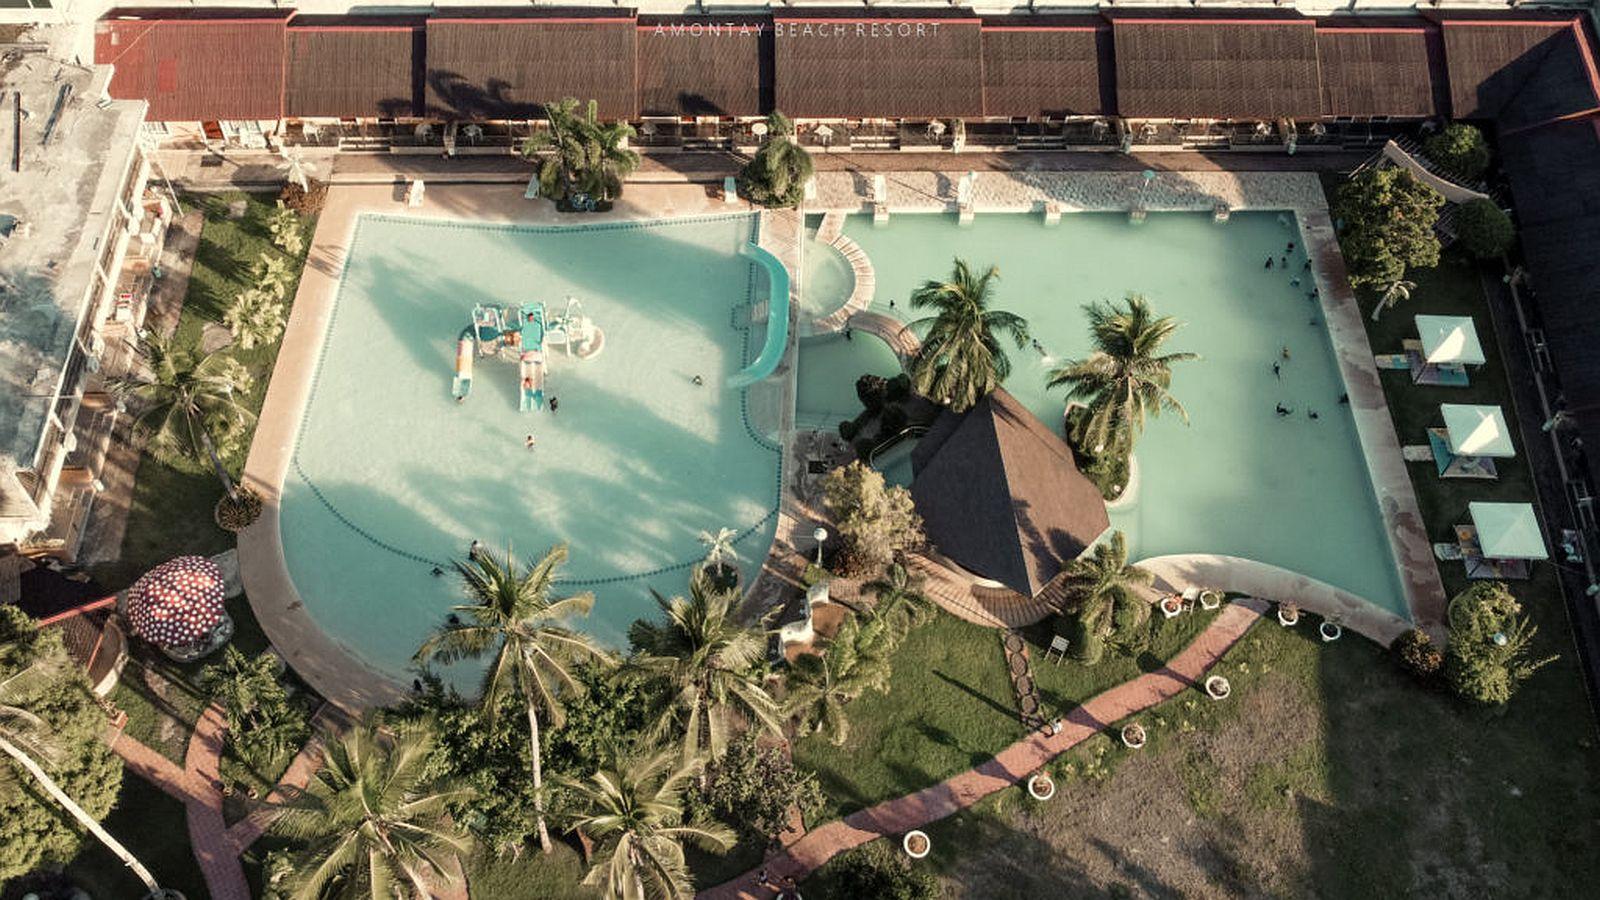 PHILIPPINEN BLOG - Sonnenuntergang-Beobachtung im Amontay Beach Resort in Nasipit